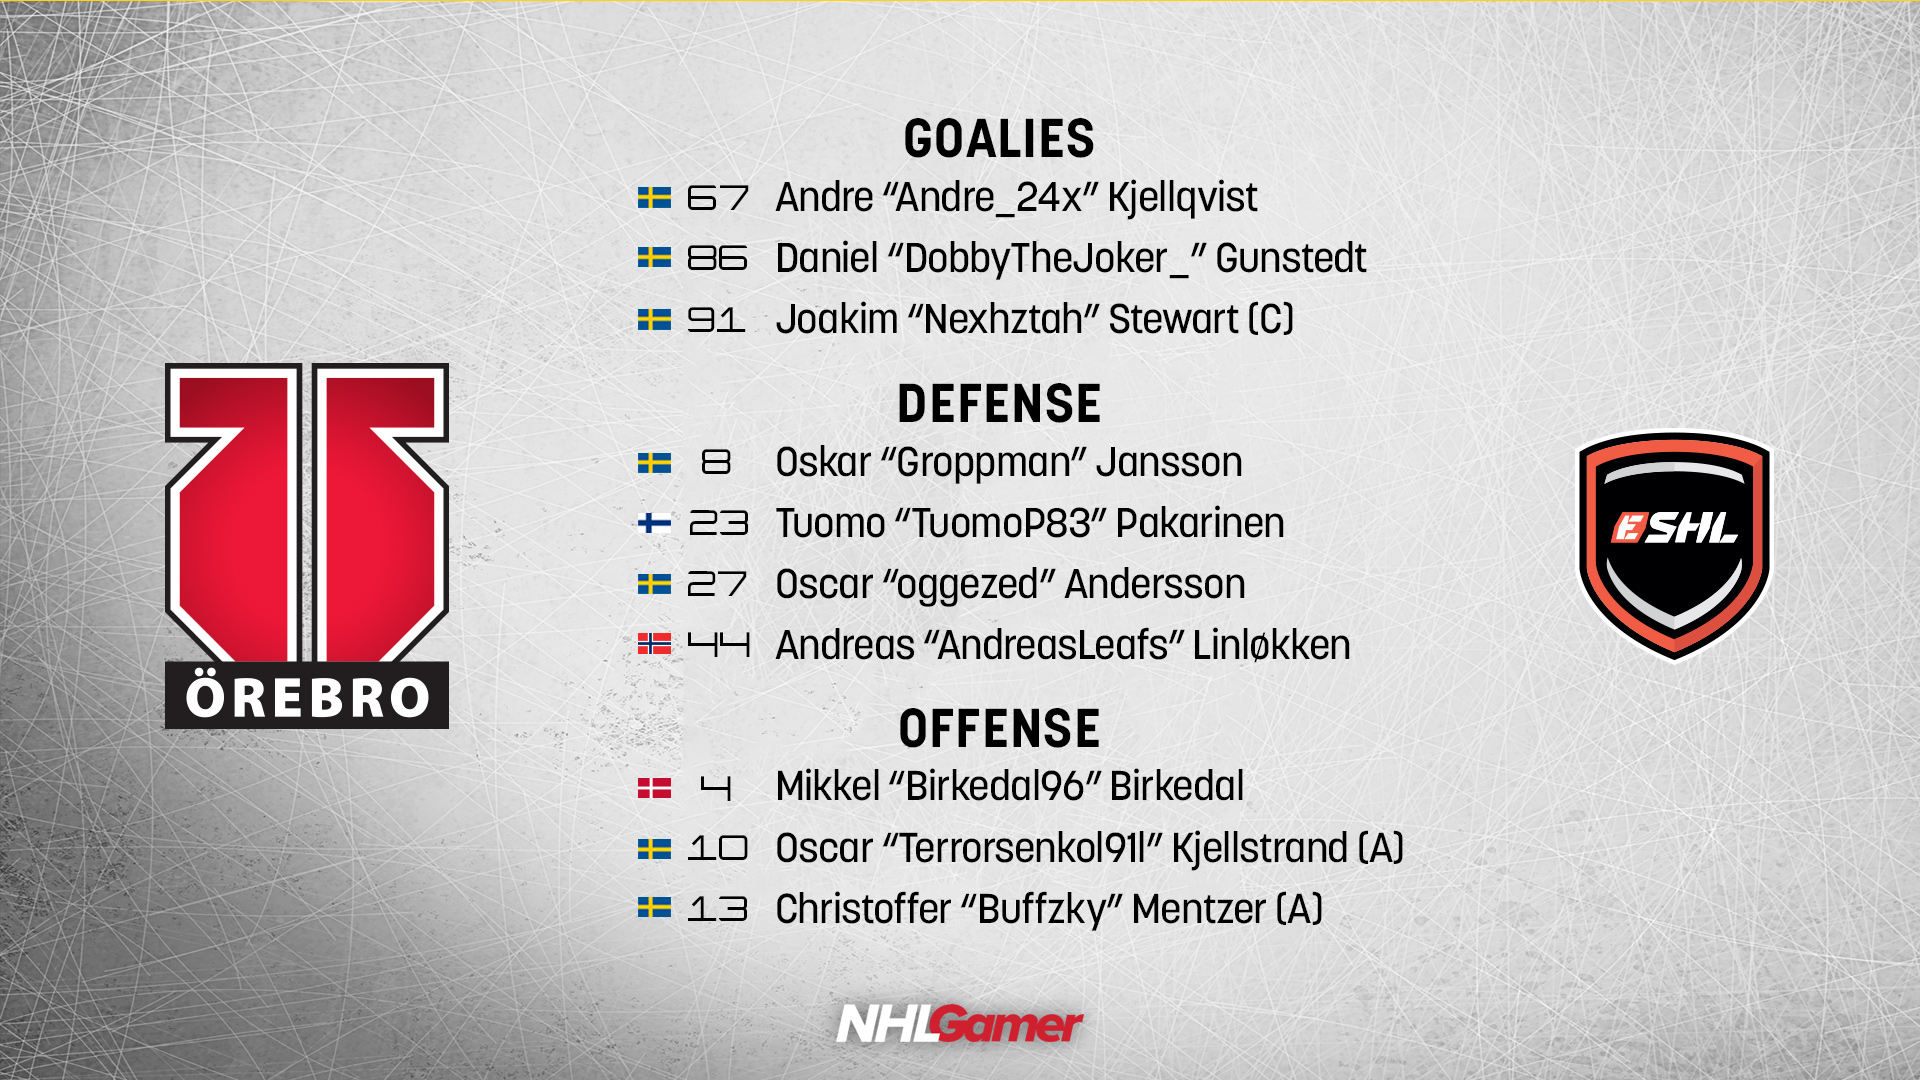 Orebro_Hockey_roster2.jpg